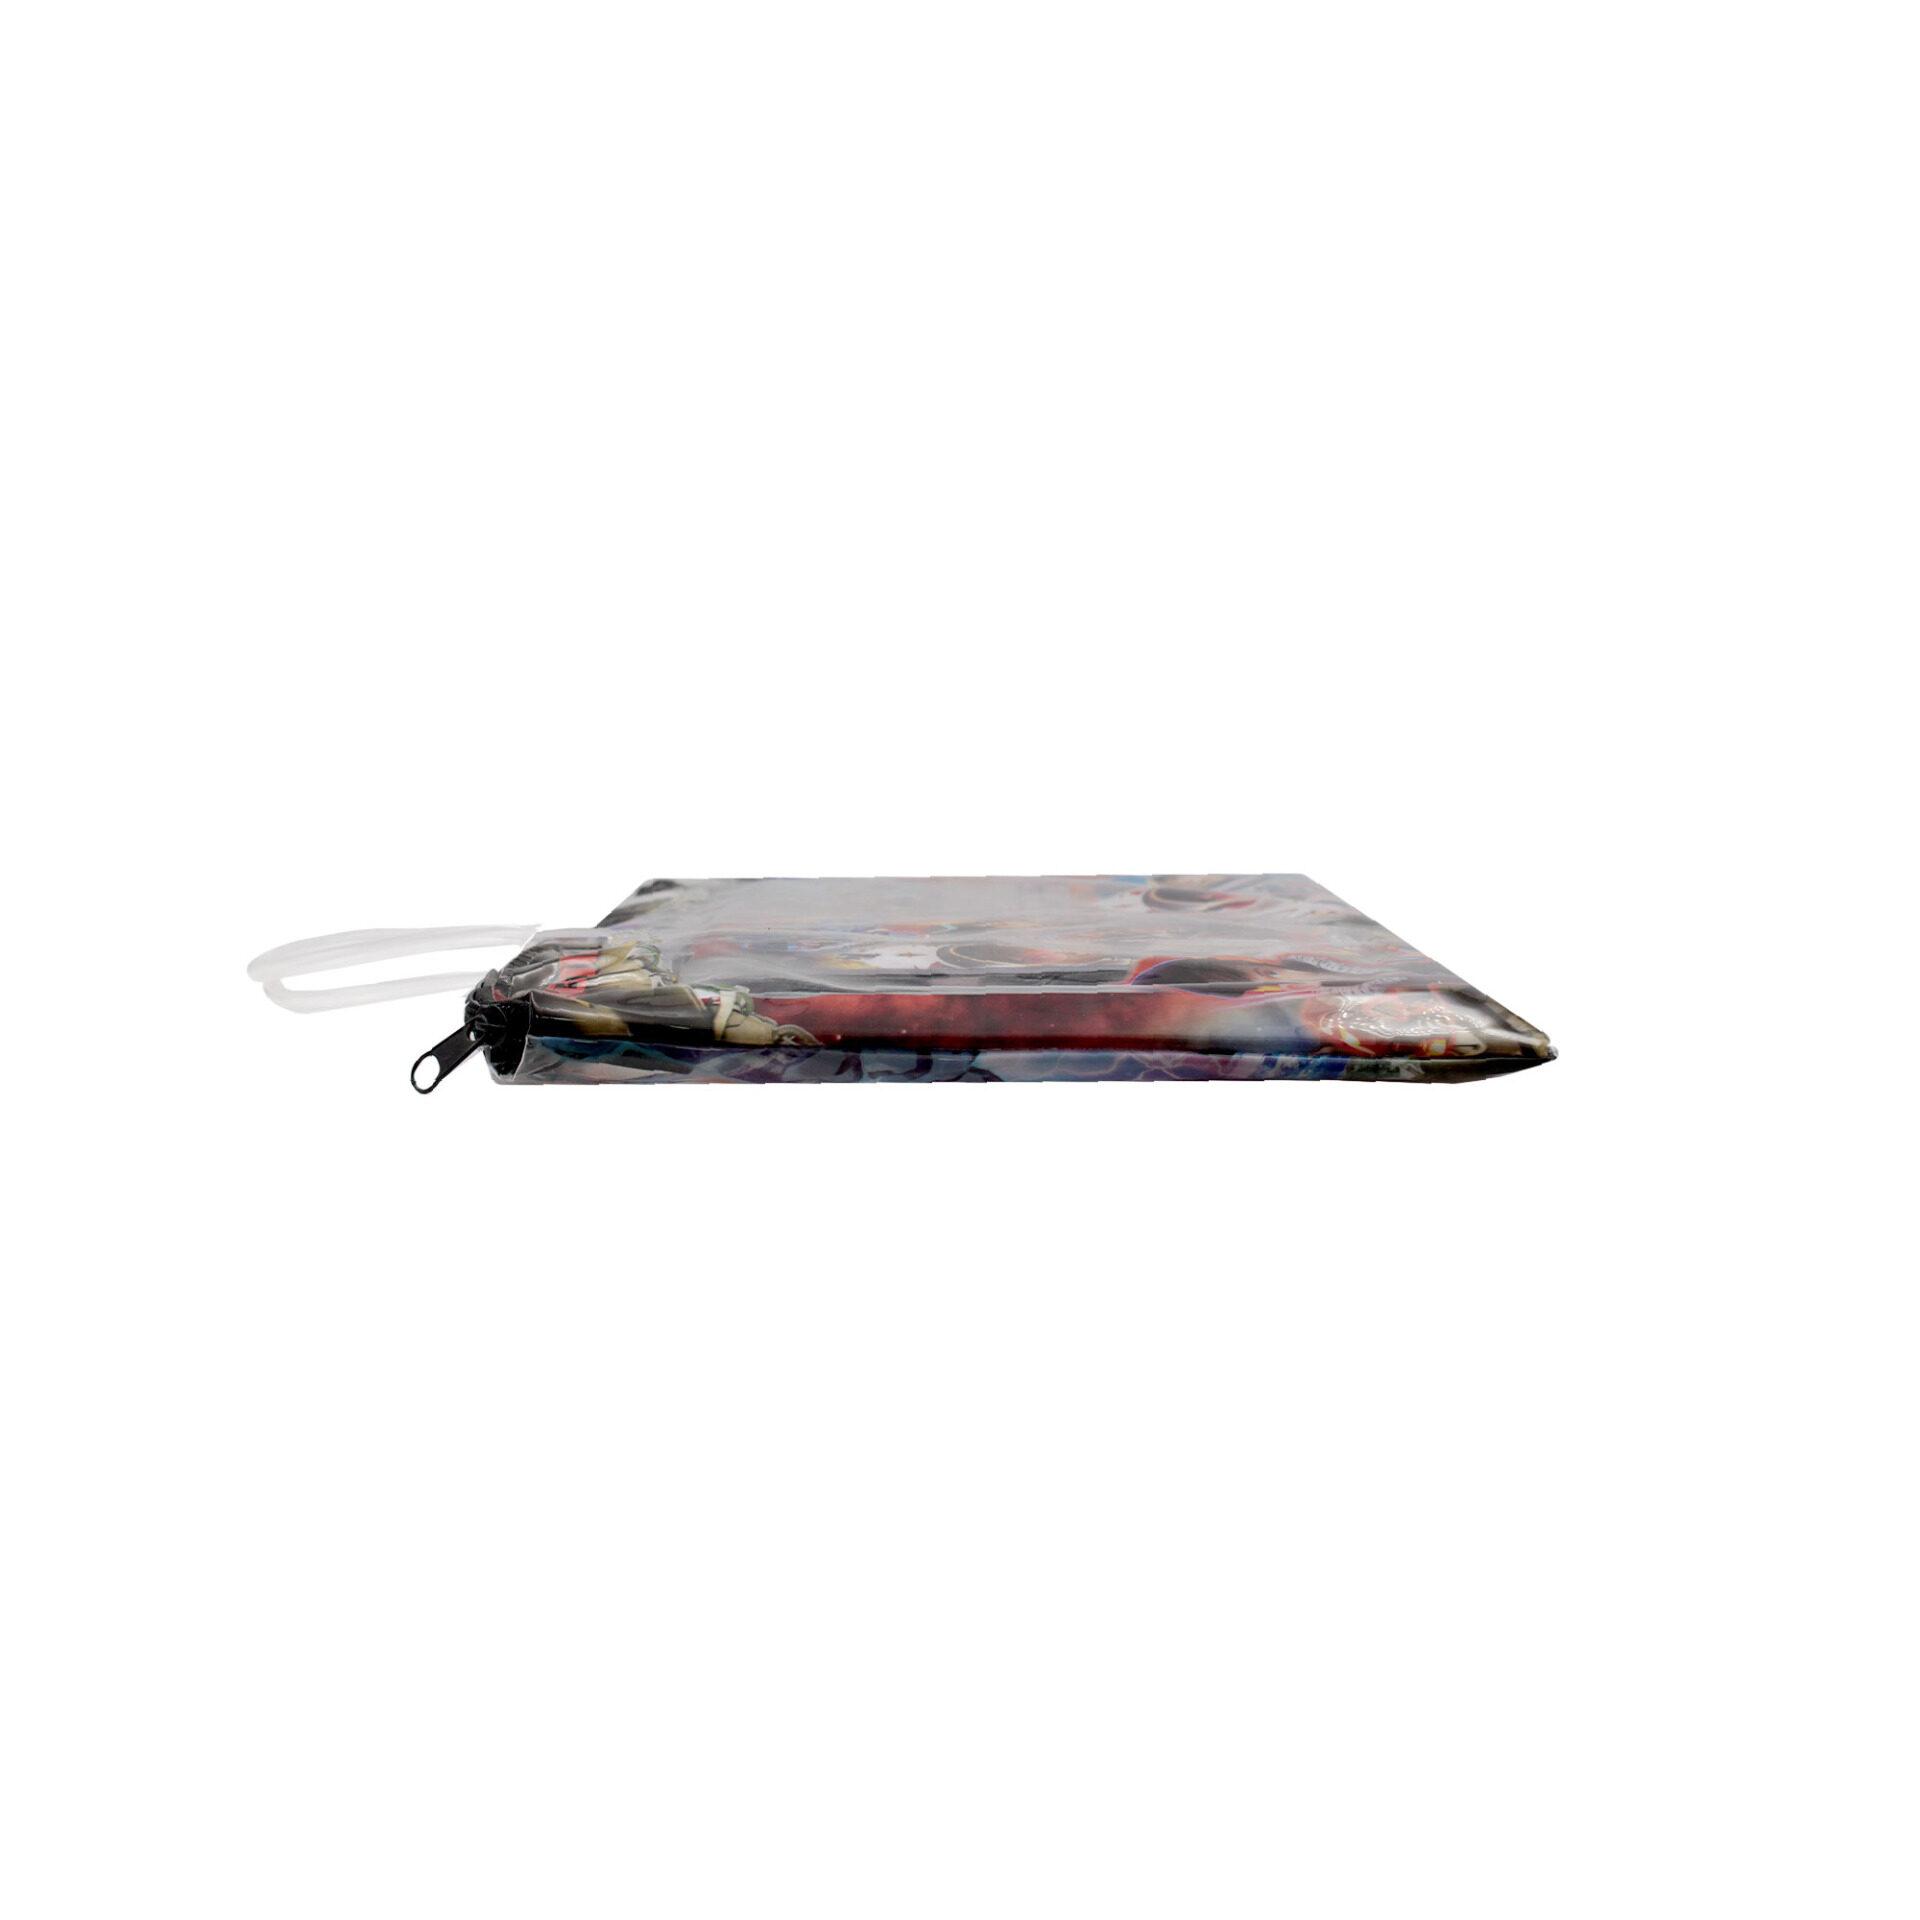 Transformers 6 in 1 Stationery Set With Pencil Case Pencil Eraser Ruler Sharperner Notepad (Boys)